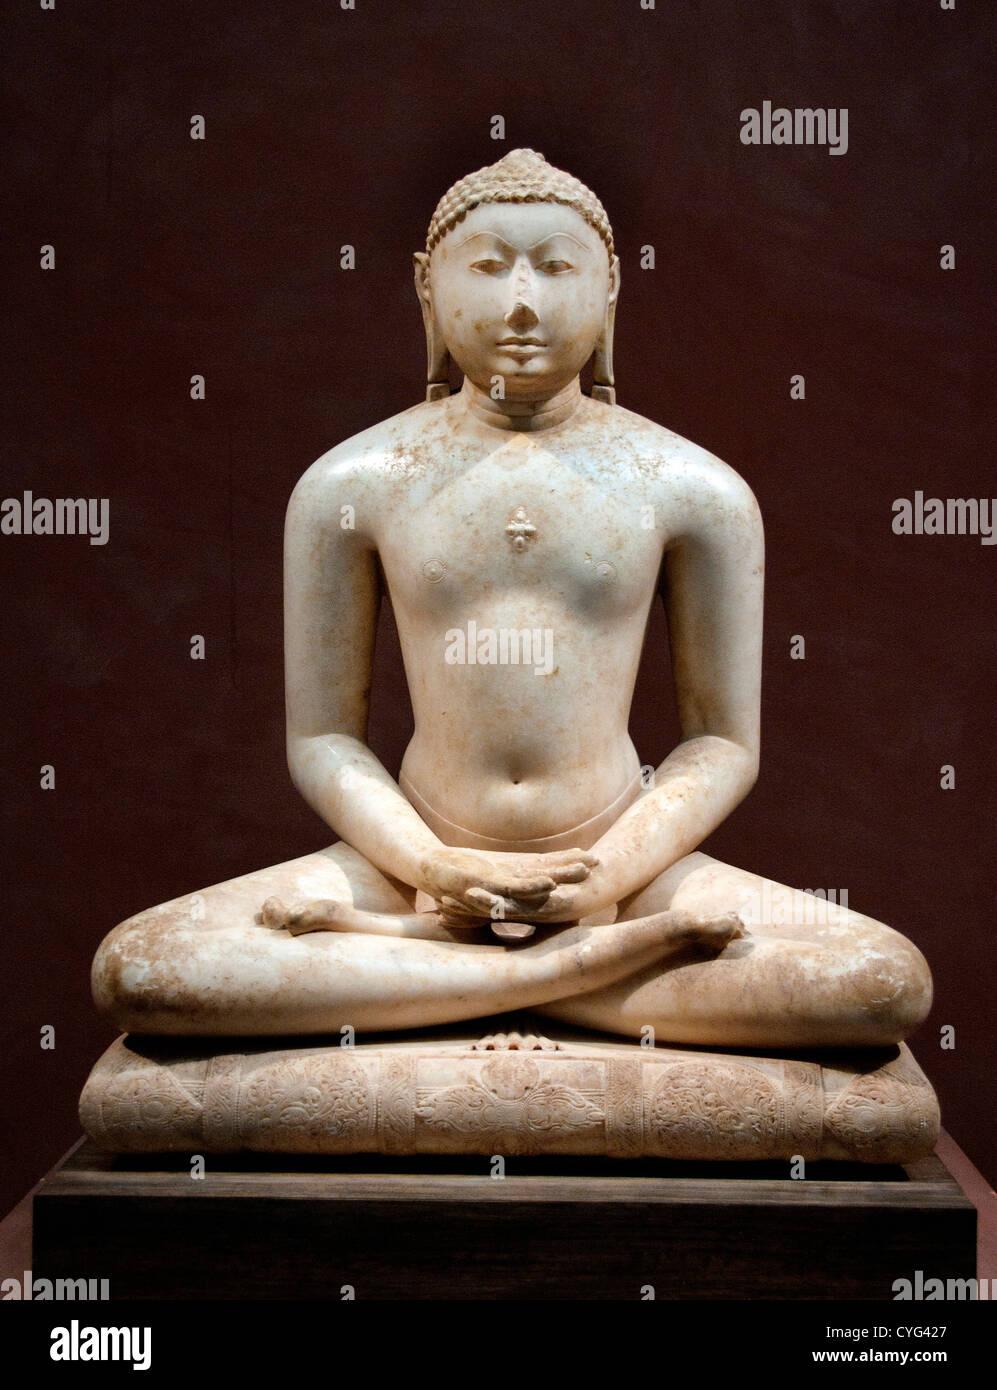 Jain Svetambara Tirthankara in Meditation Solanki 11th century India Gujarat or Rajasthan Marble 99 cm - Stock Image